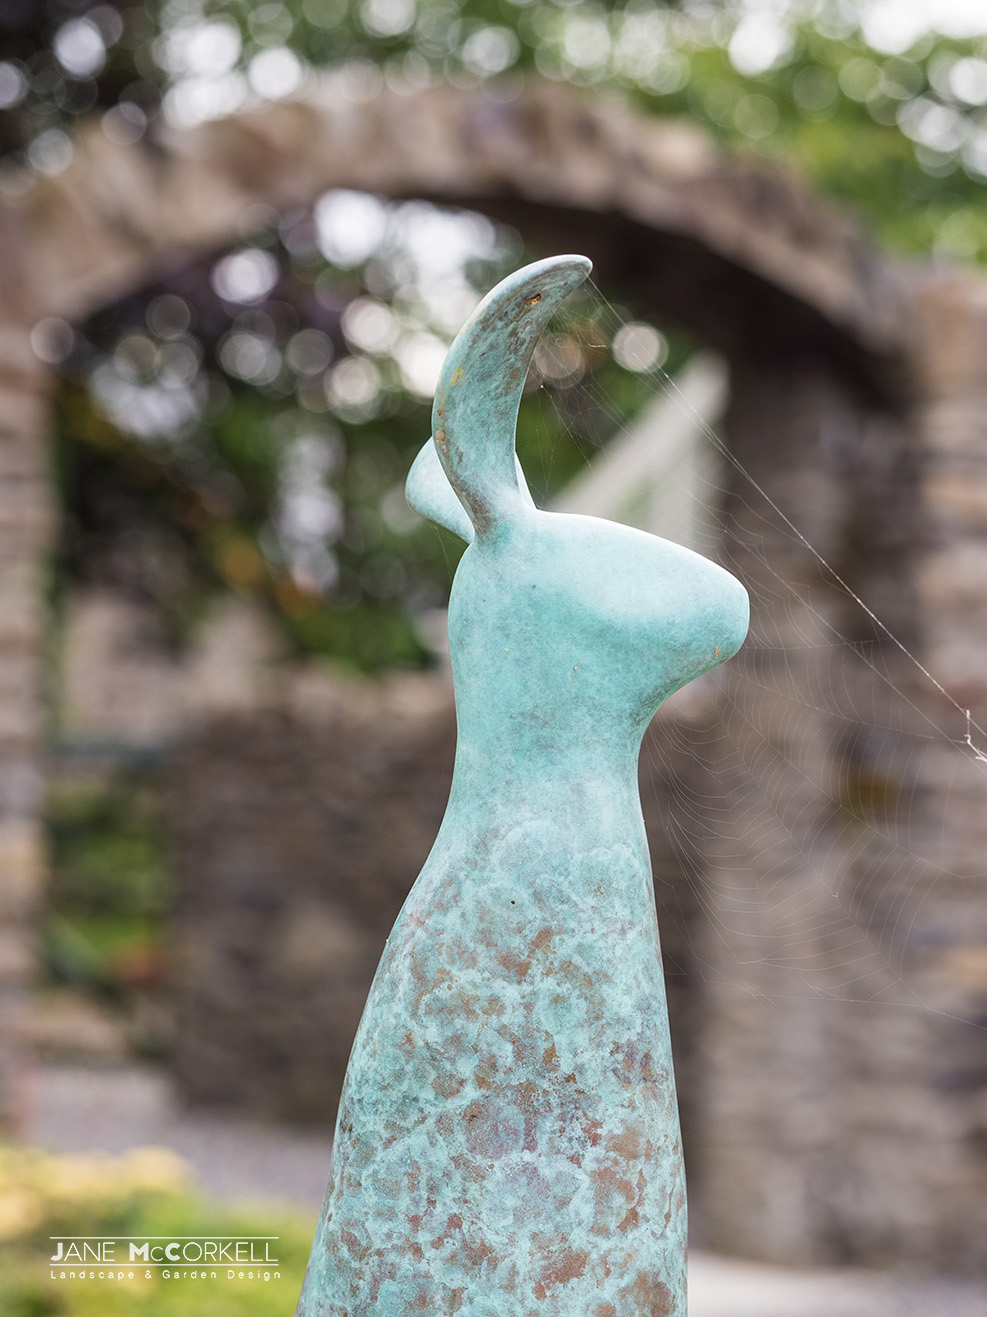 Kildare garden jane mccorkell for Garden design kildare